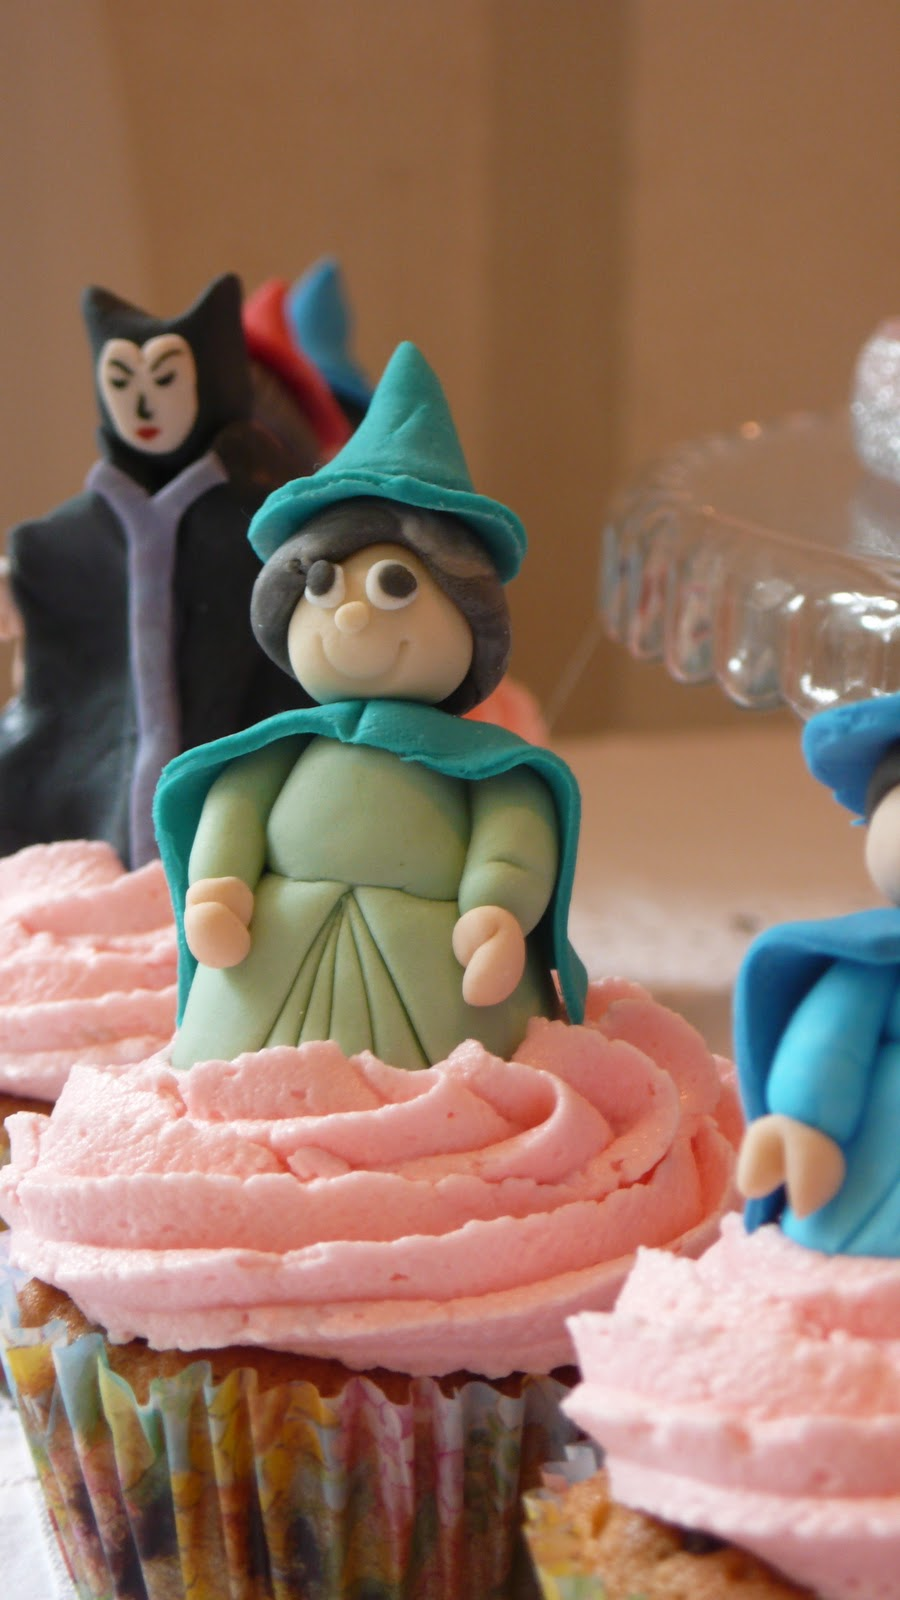 Fauna Sleeping Beauty Cake